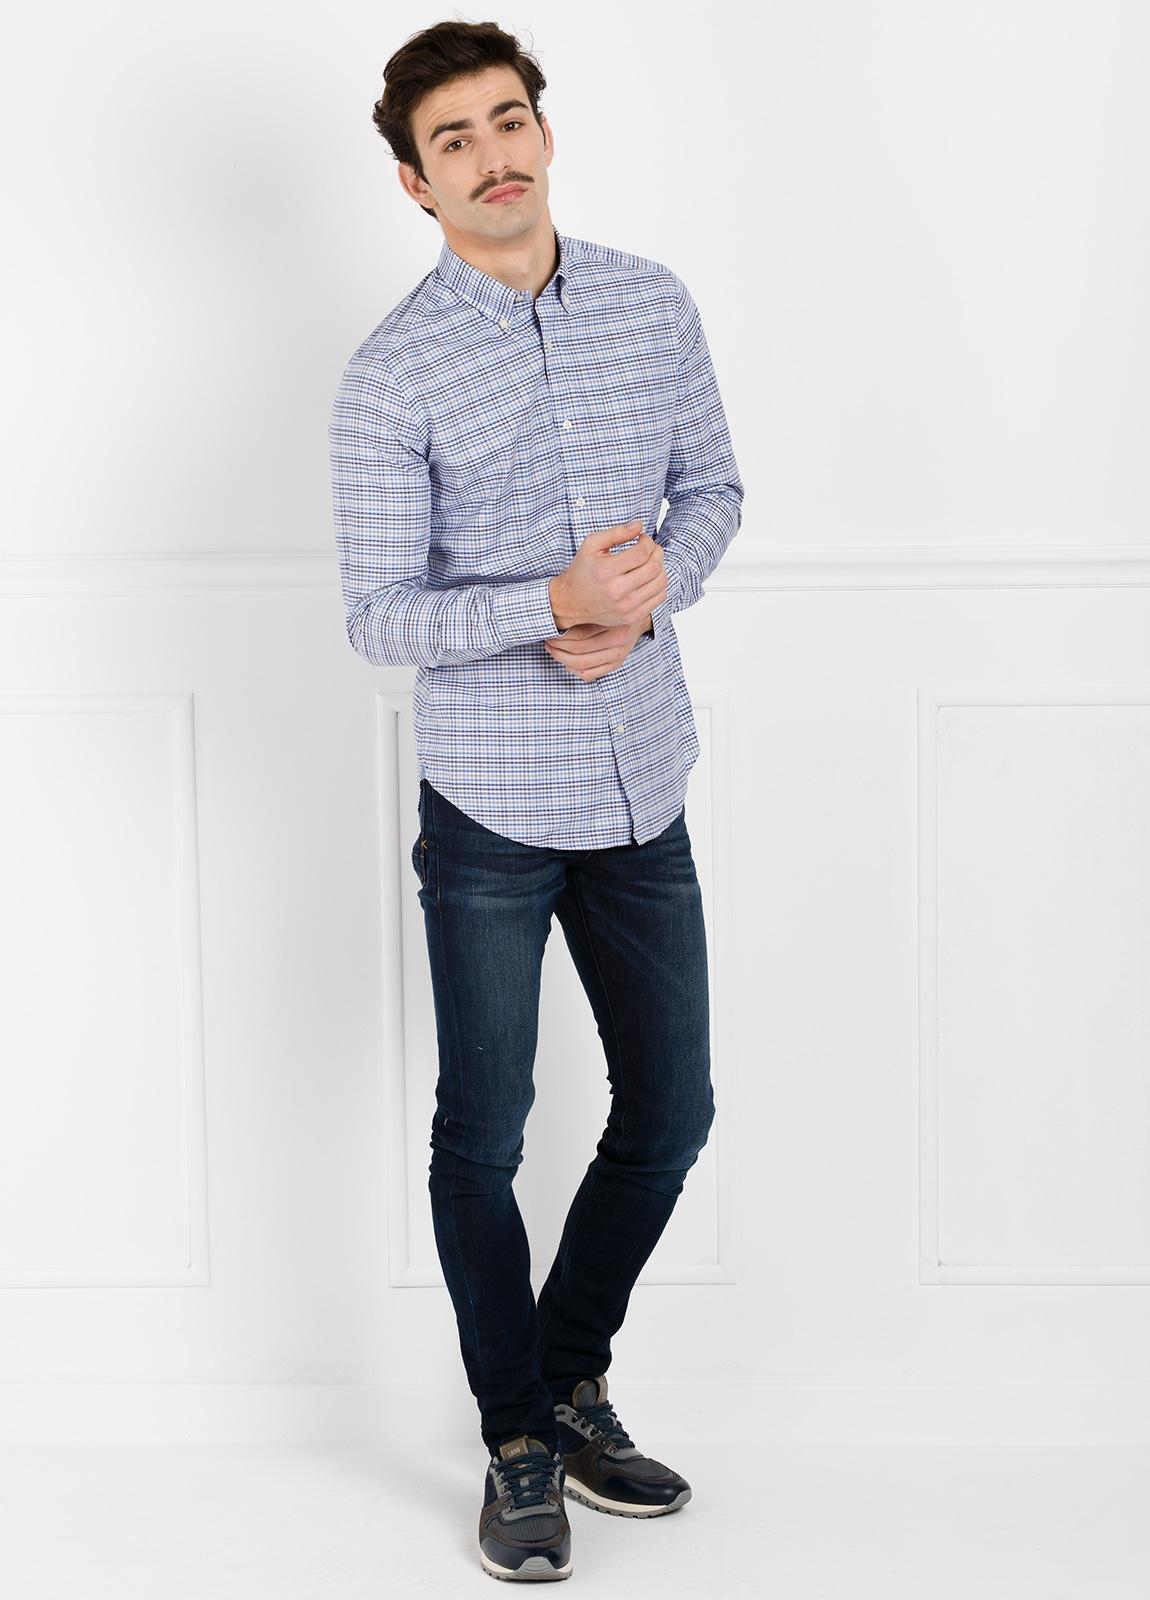 Camisa Leisure Wear REGULAR FIT Modelo BOTTON DOWN cuadros color azul. 100% Algodón.